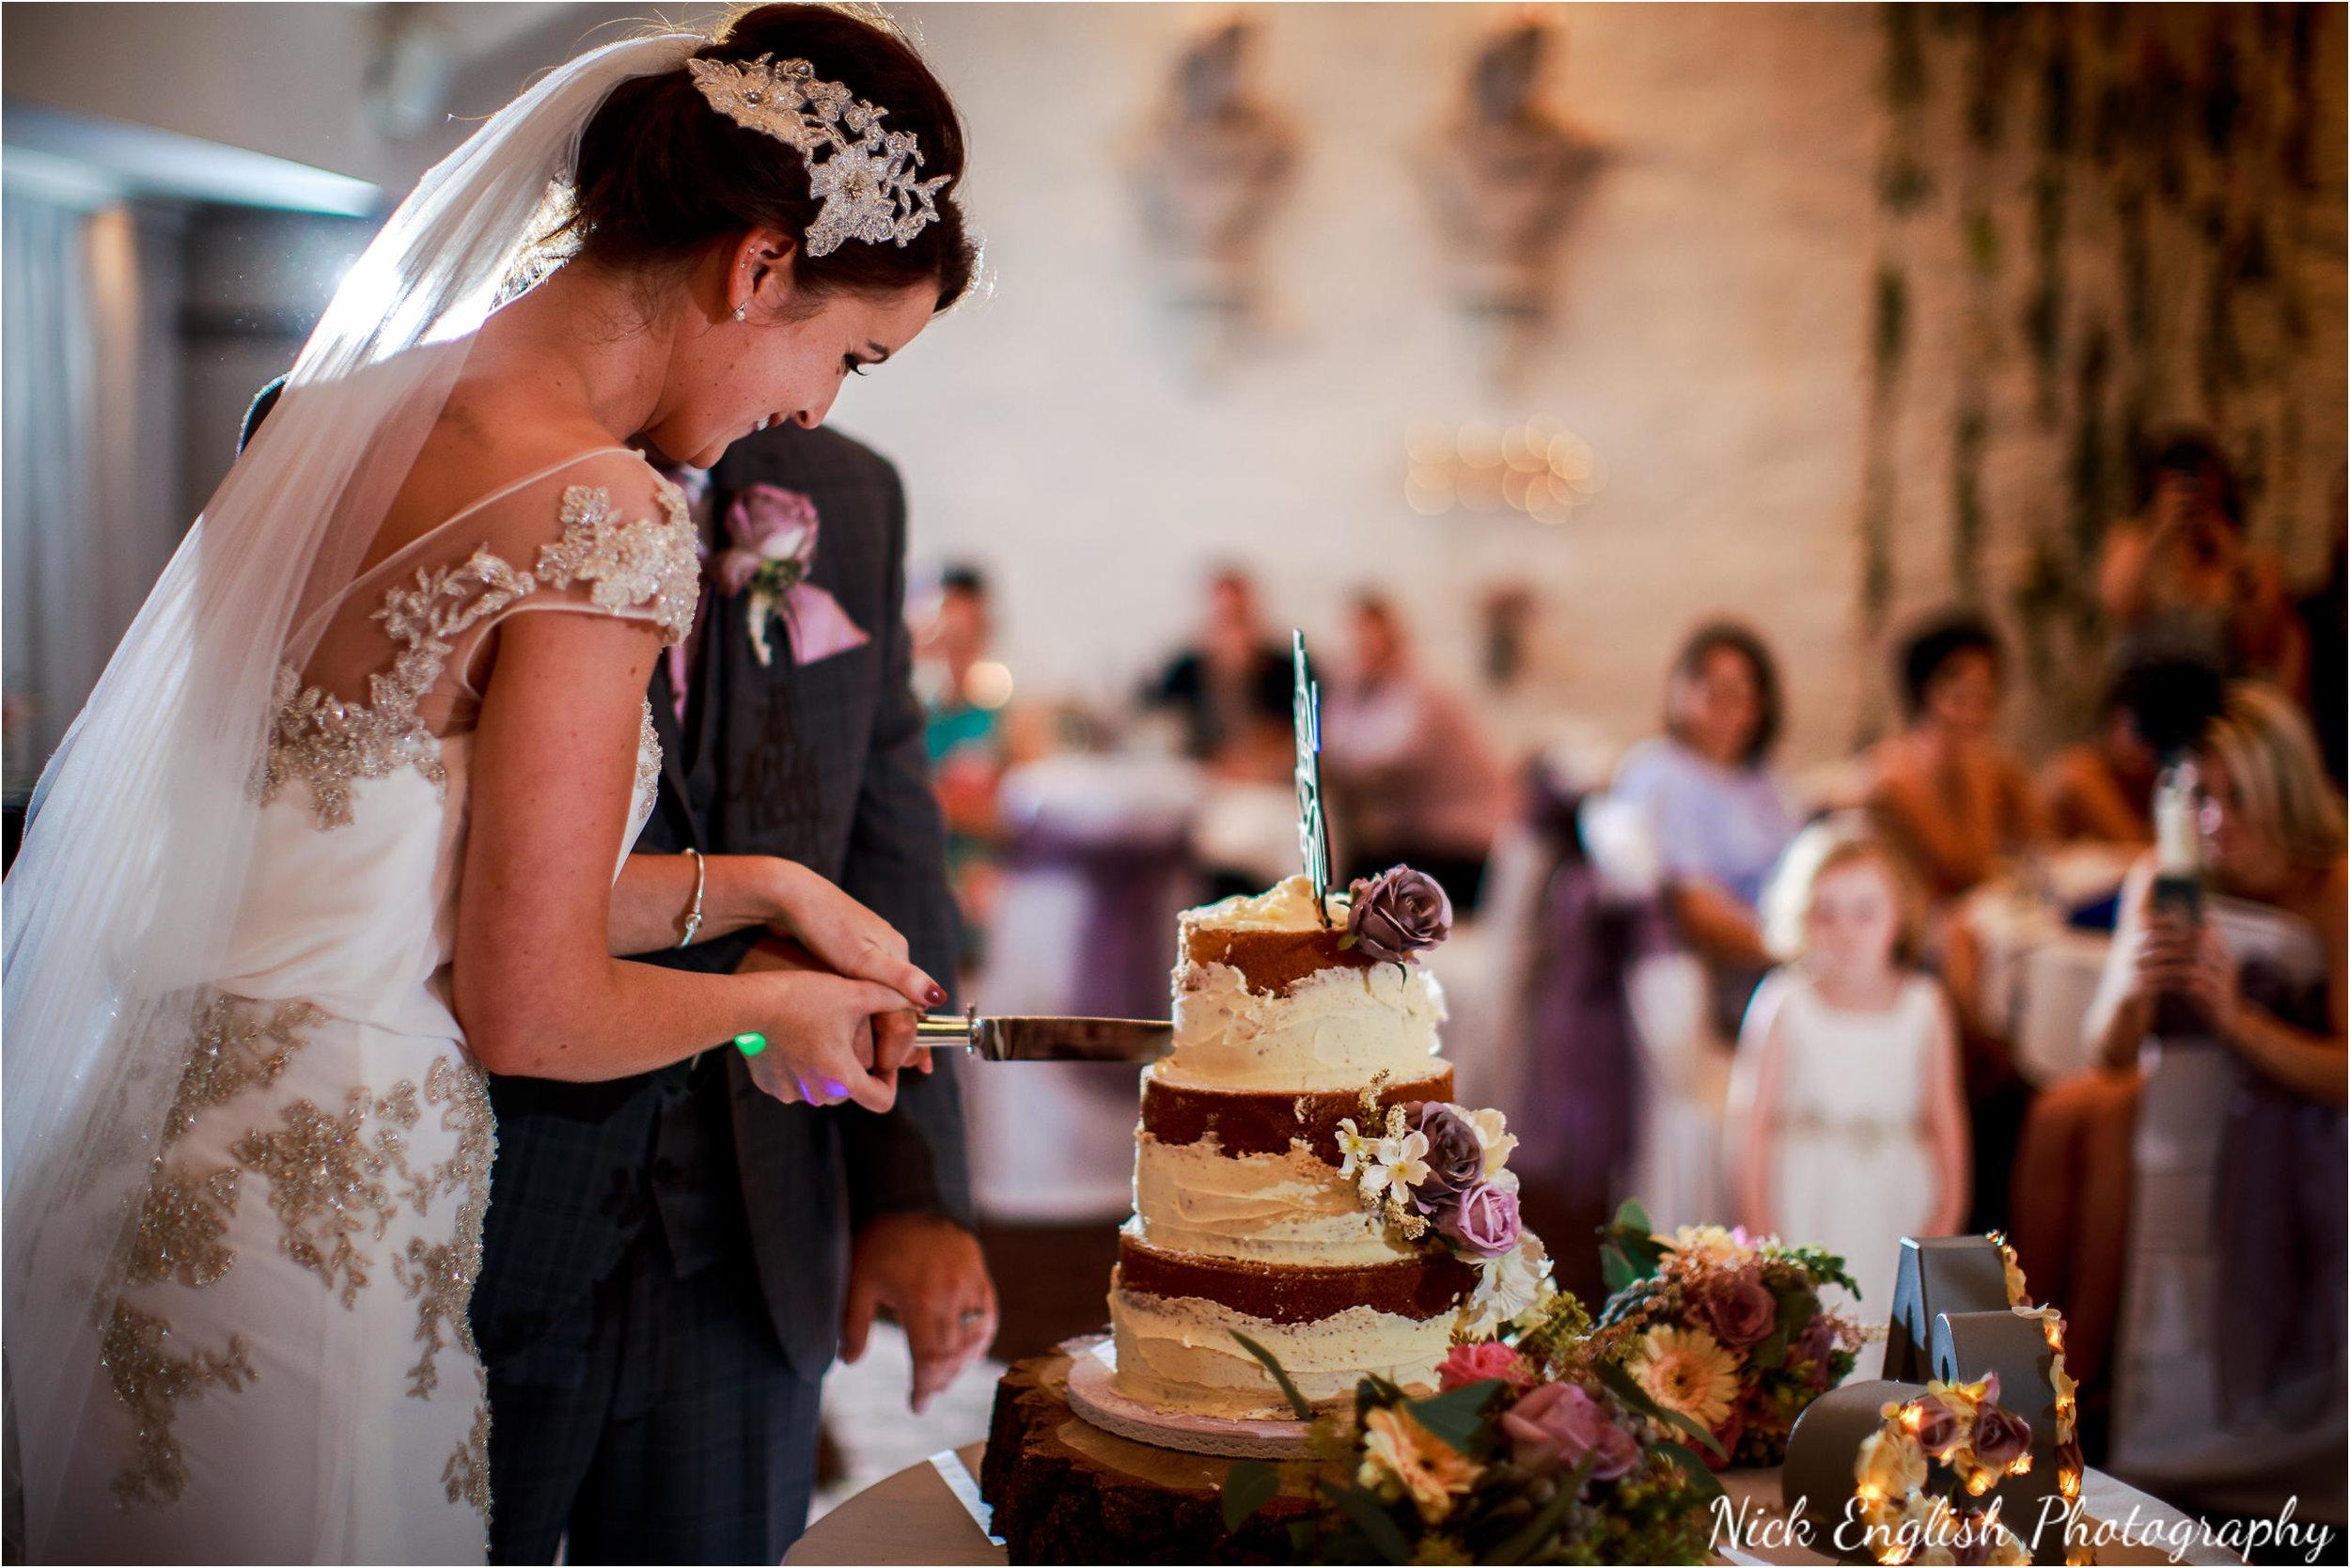 Stacey-Ash-Wedding-Photographs-Stanley-House-Preston-Lancashire-240.jpg